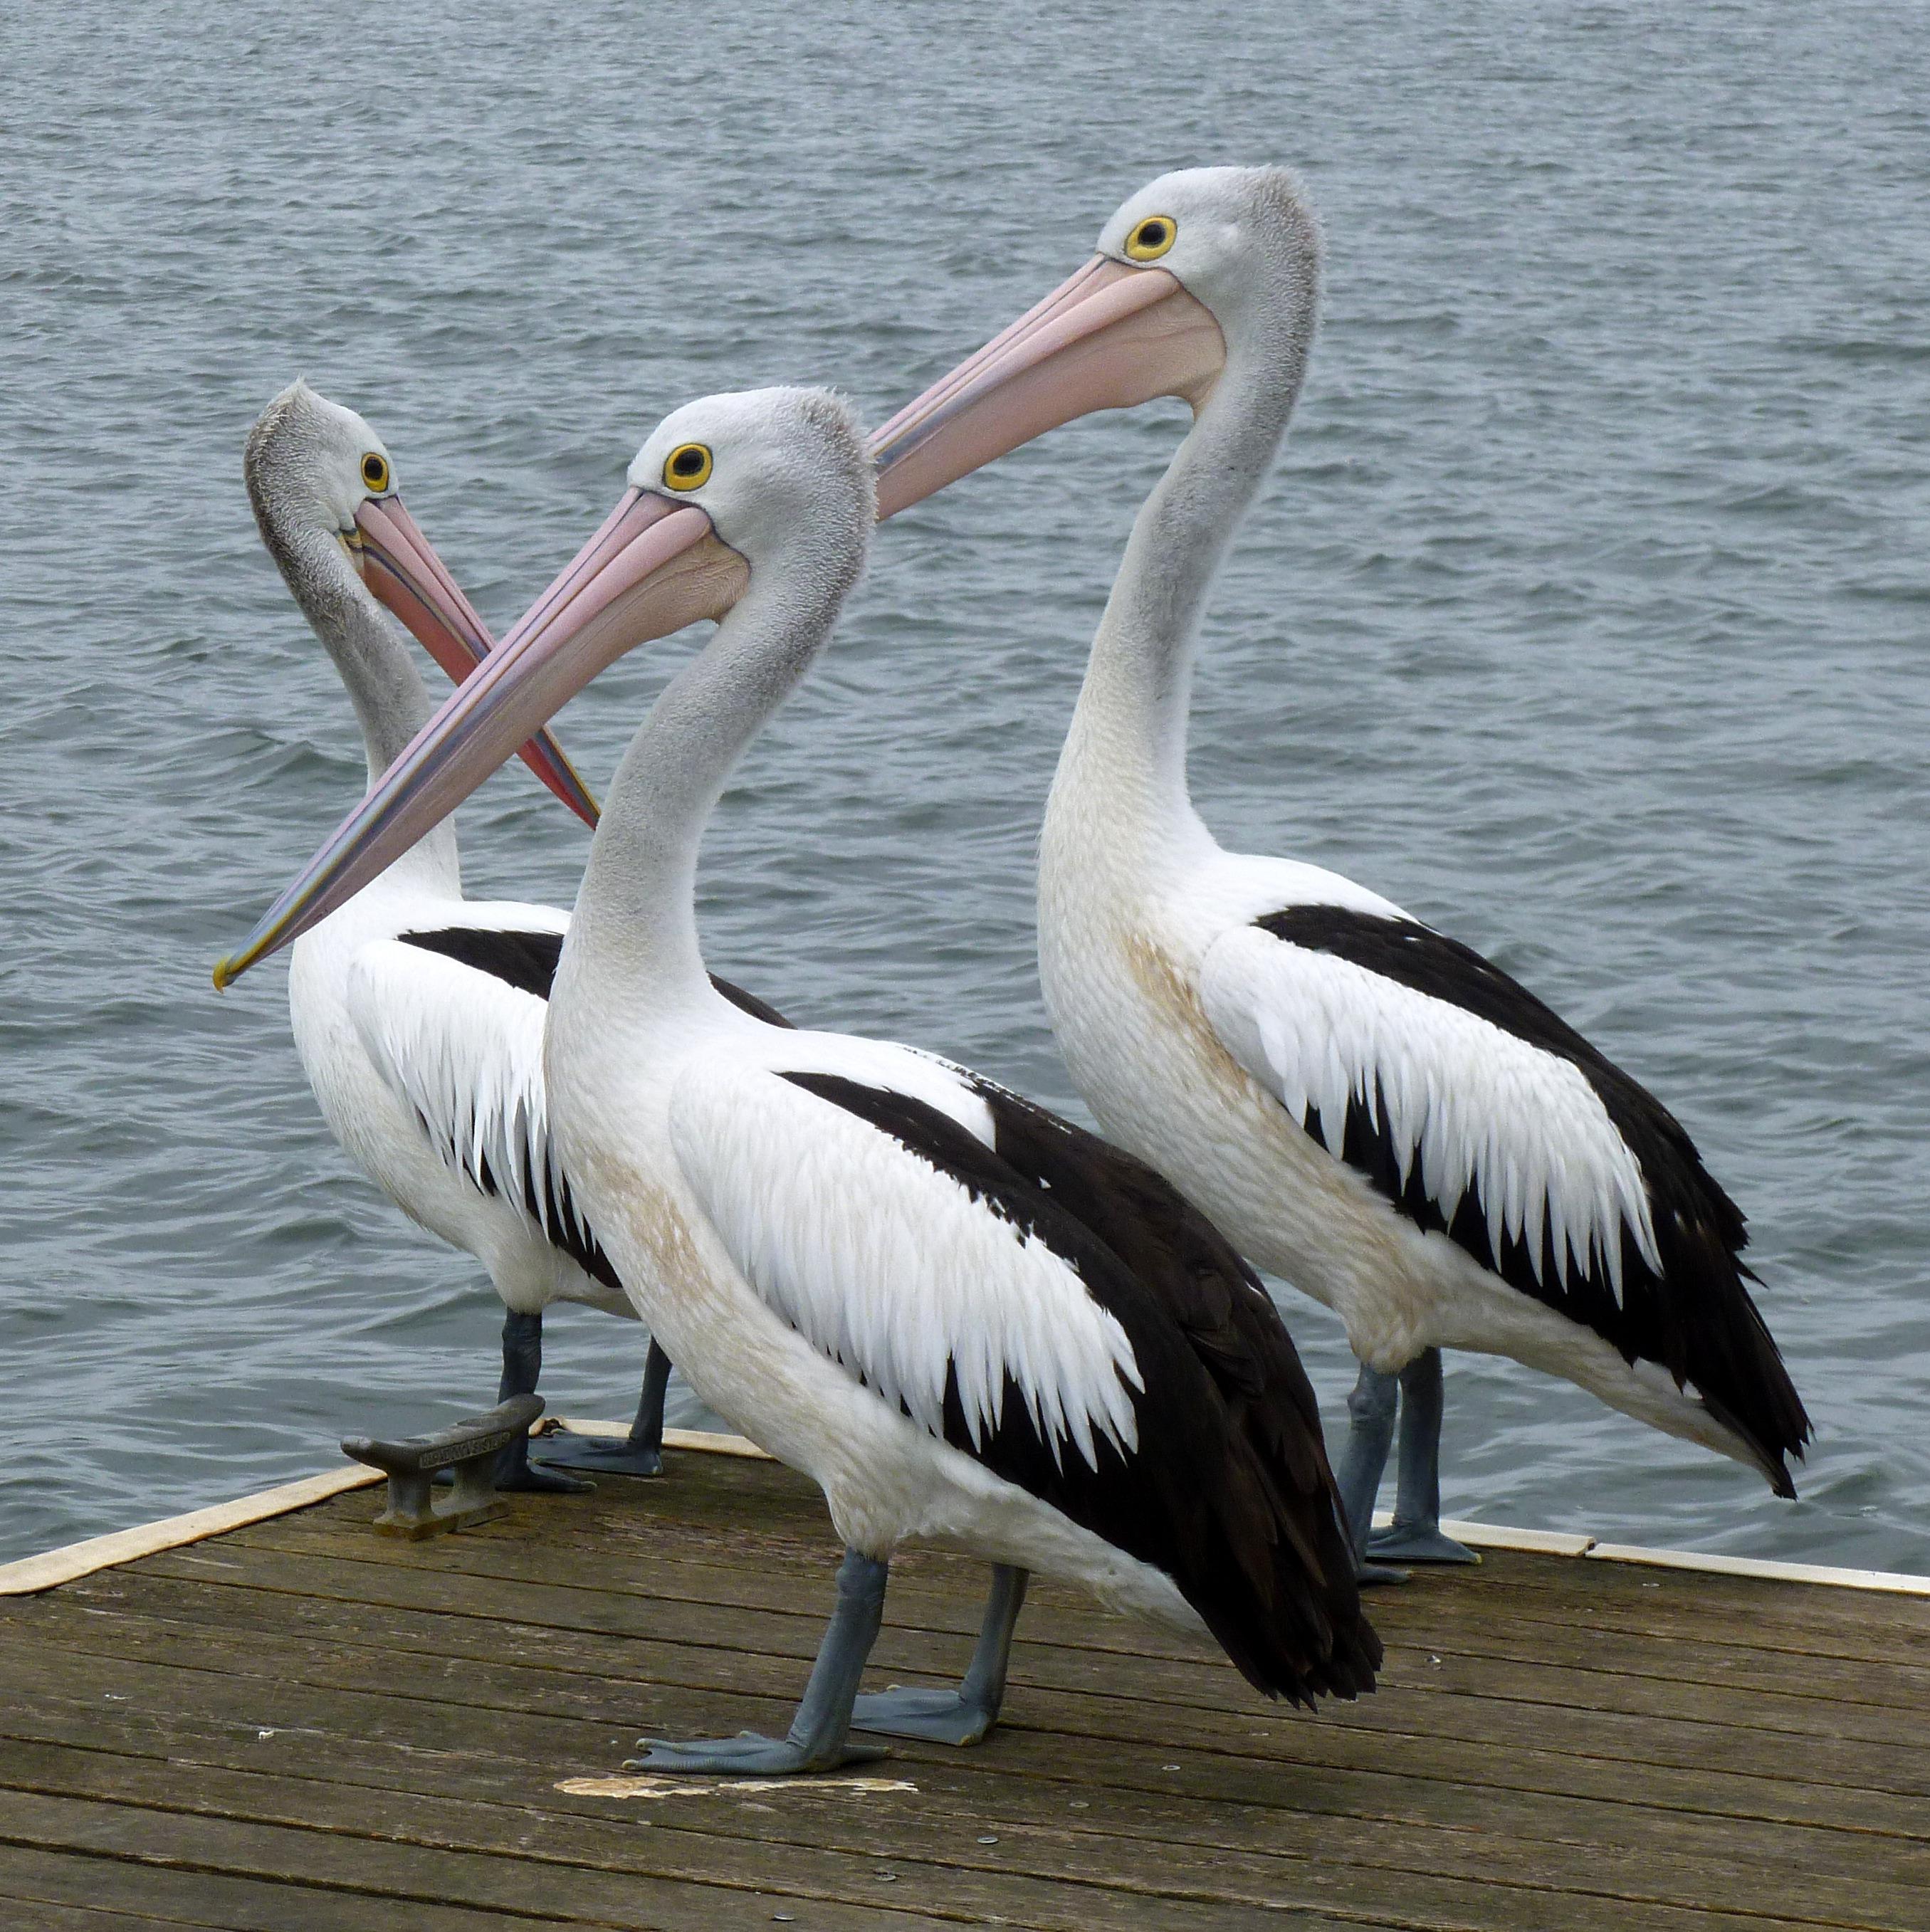 Banco de imagens agua natureza asa animal pelicano - Fotos de pelicanos ...